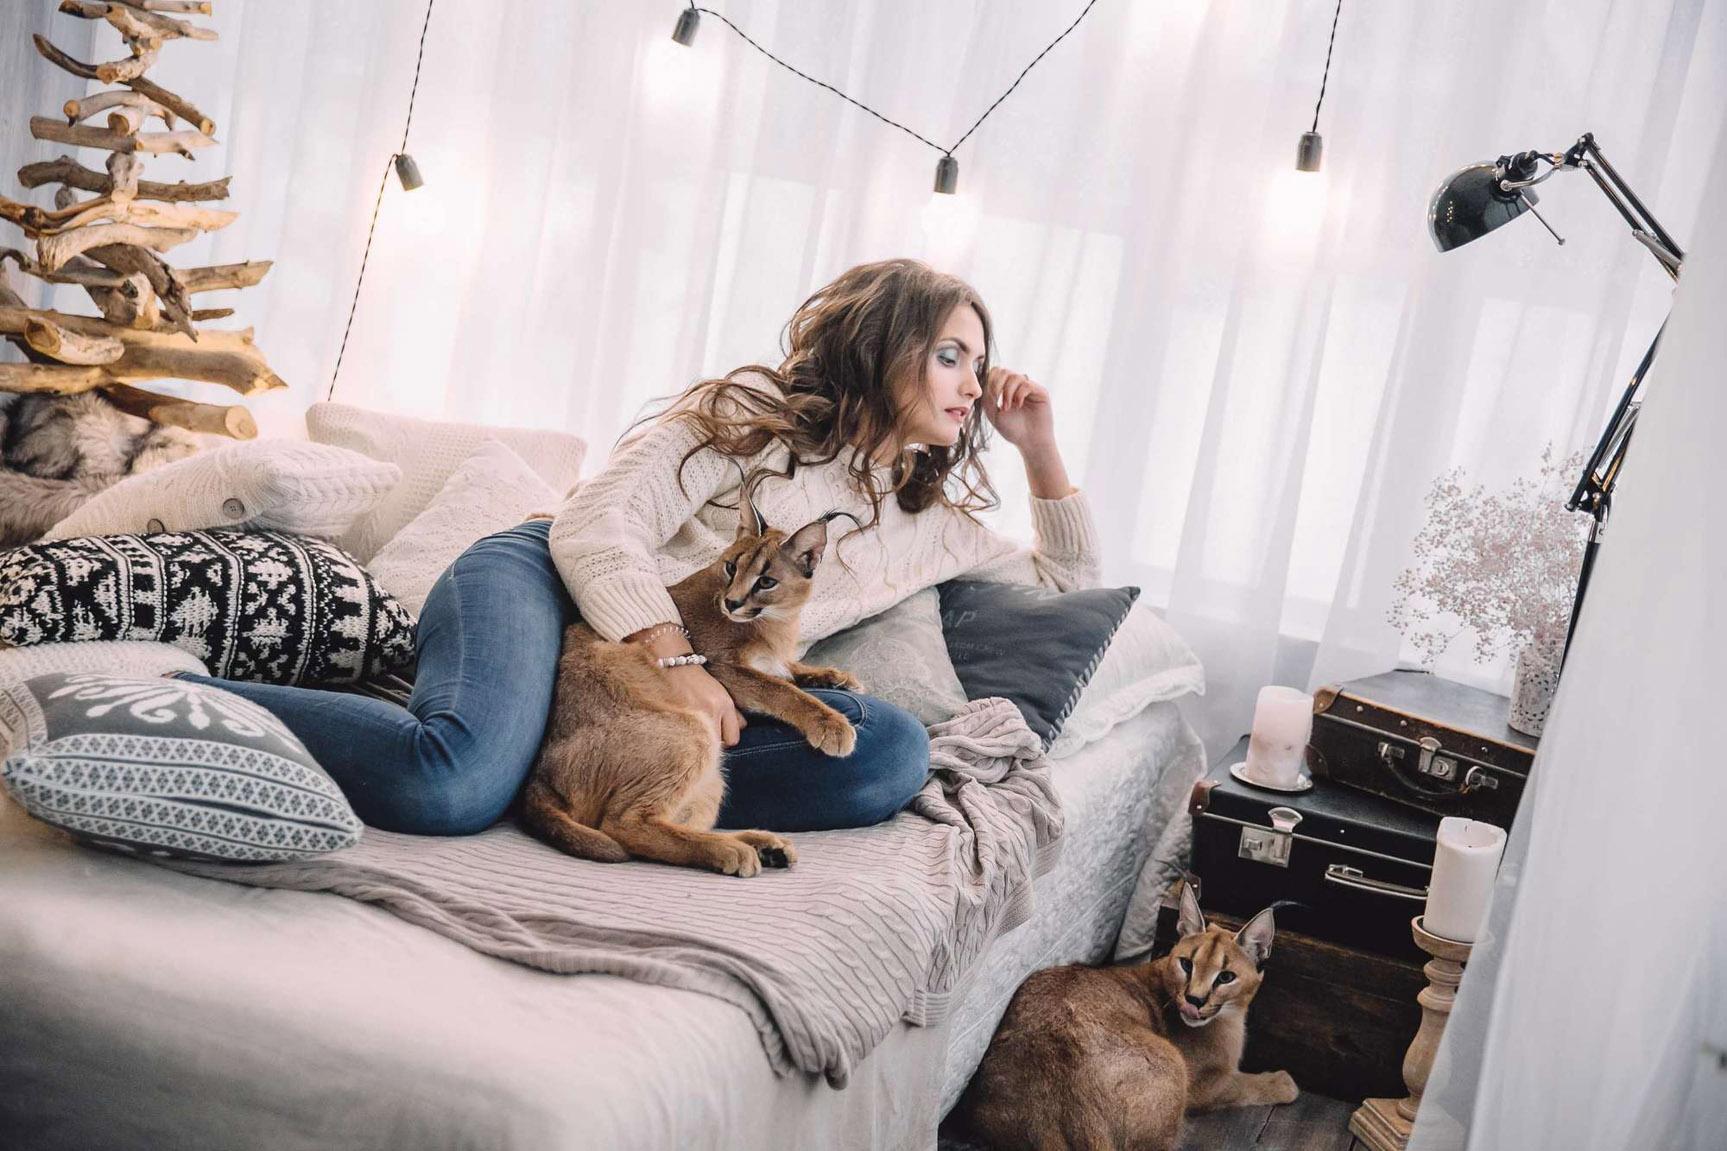 Каракалы, питомник Soul Cats - фотограф Ксения Чебиряк